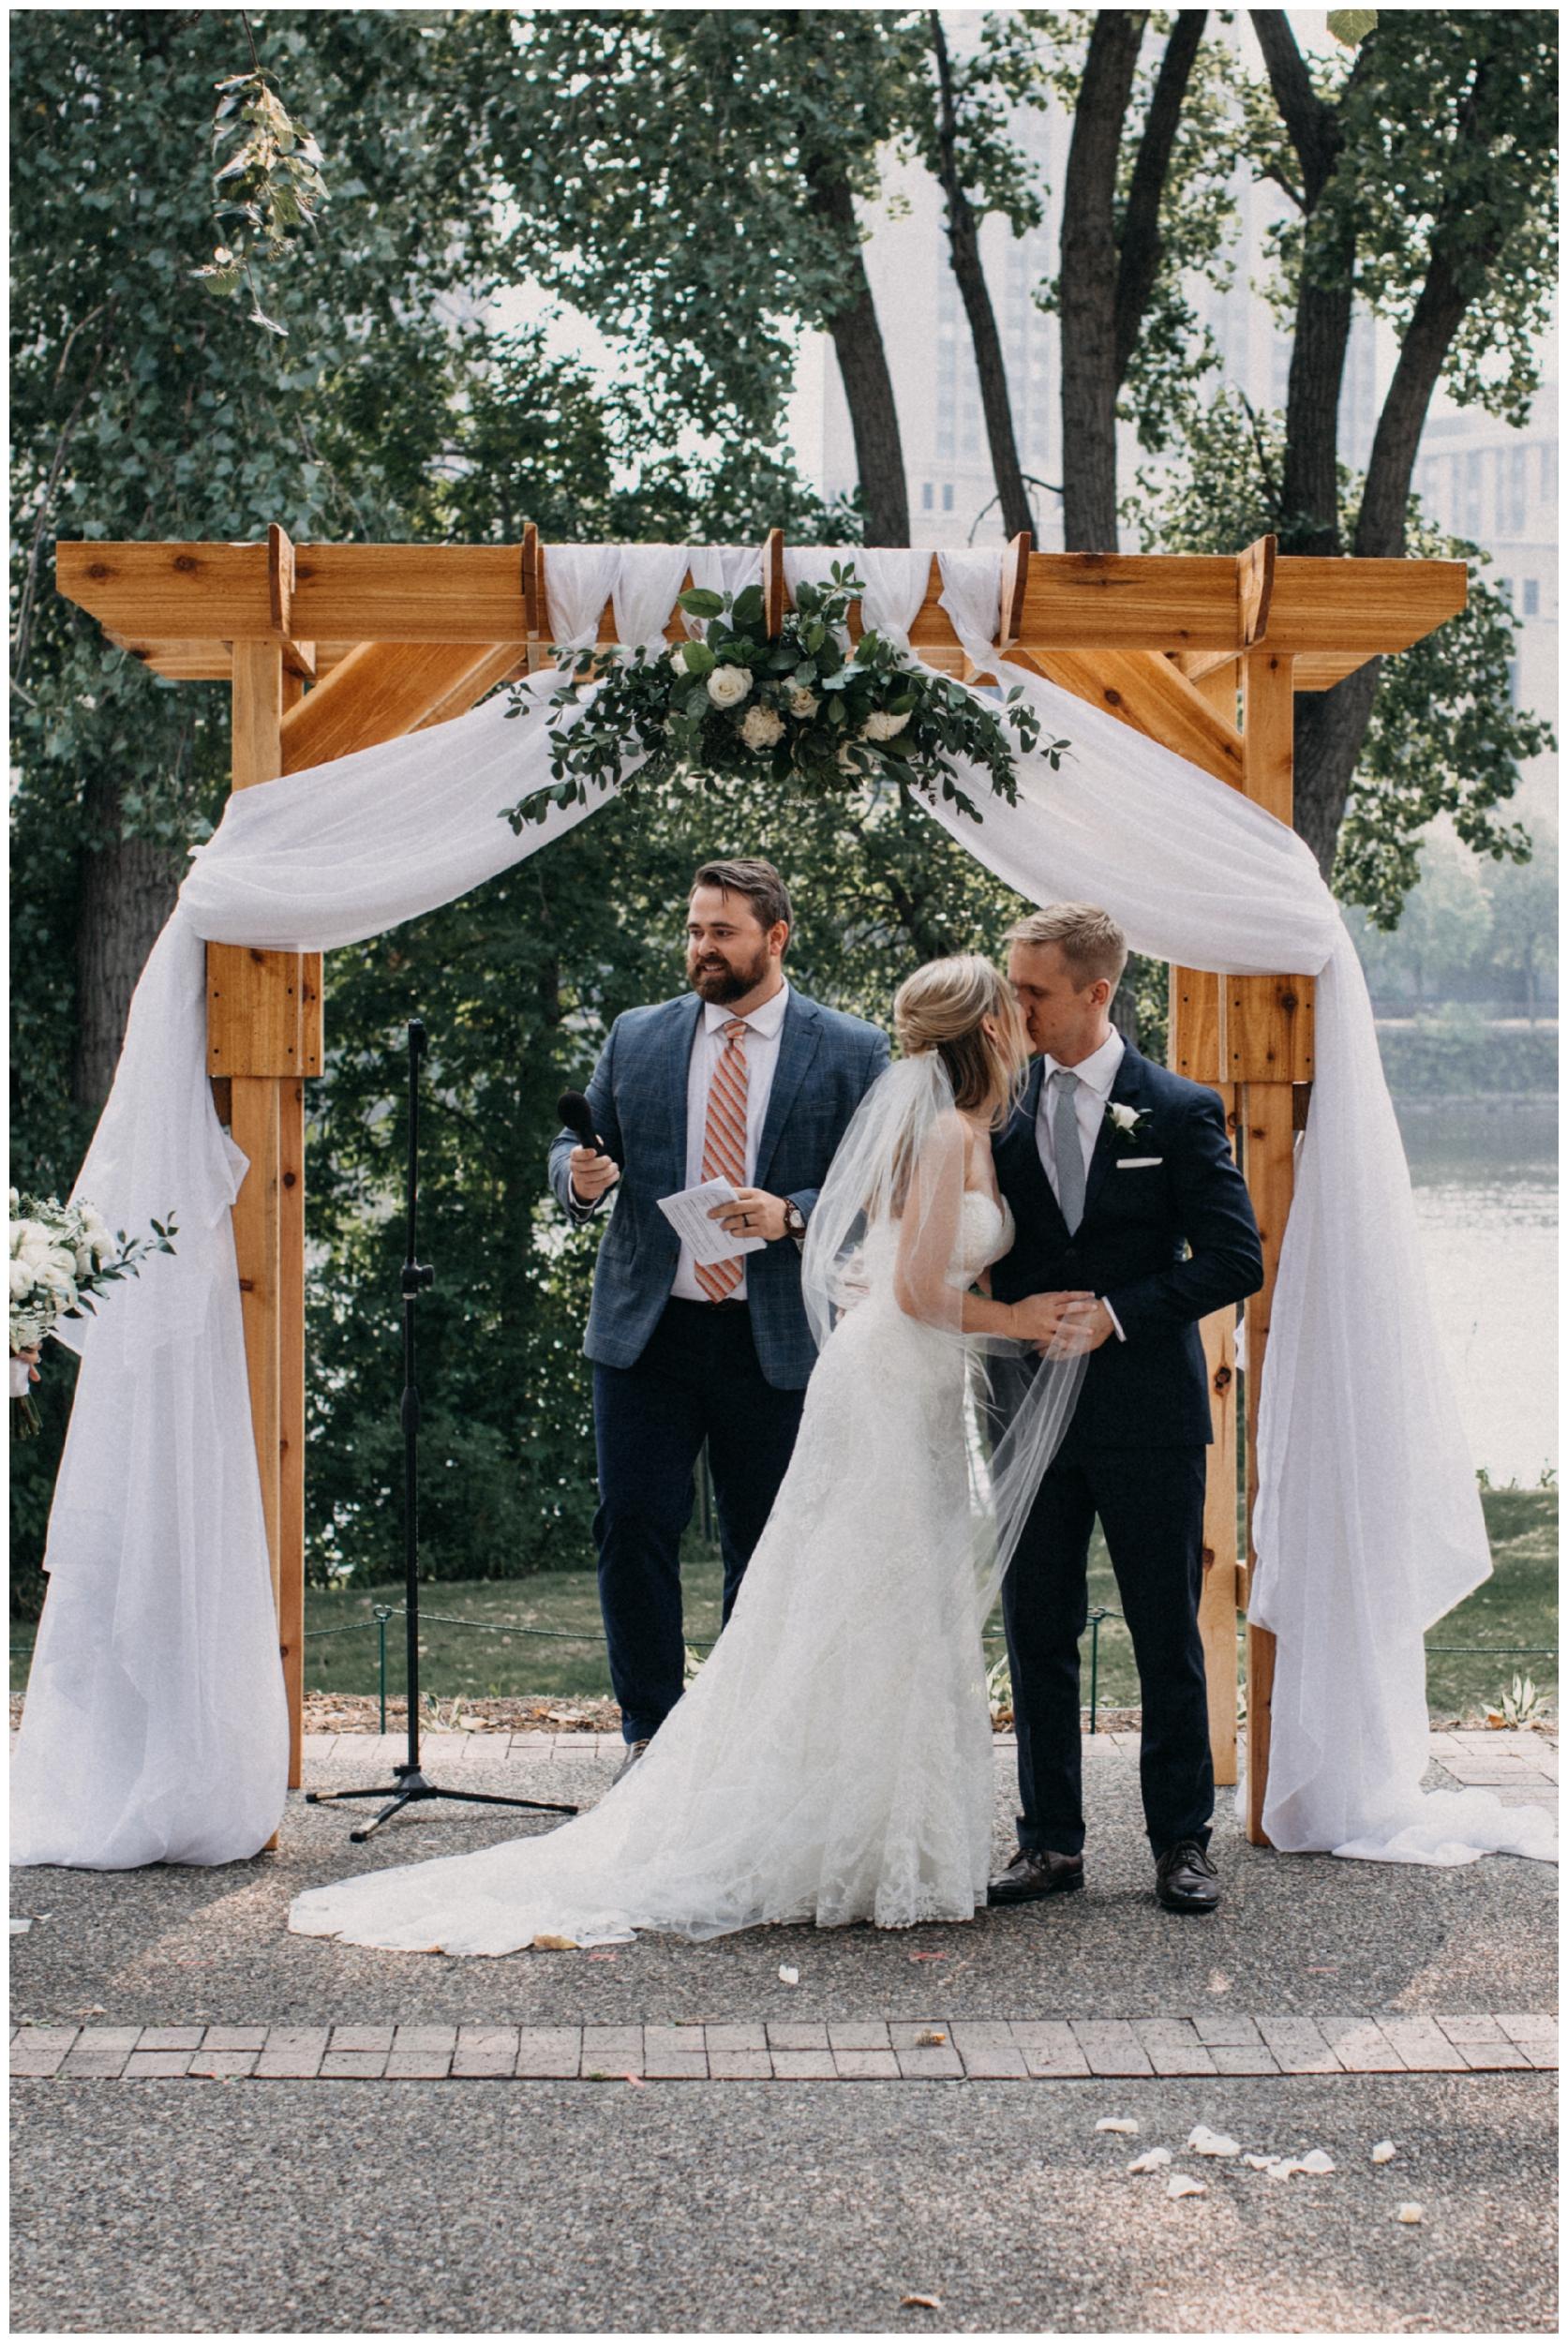 Outdoor wedding ceremony at Nicollet Island Pavilion